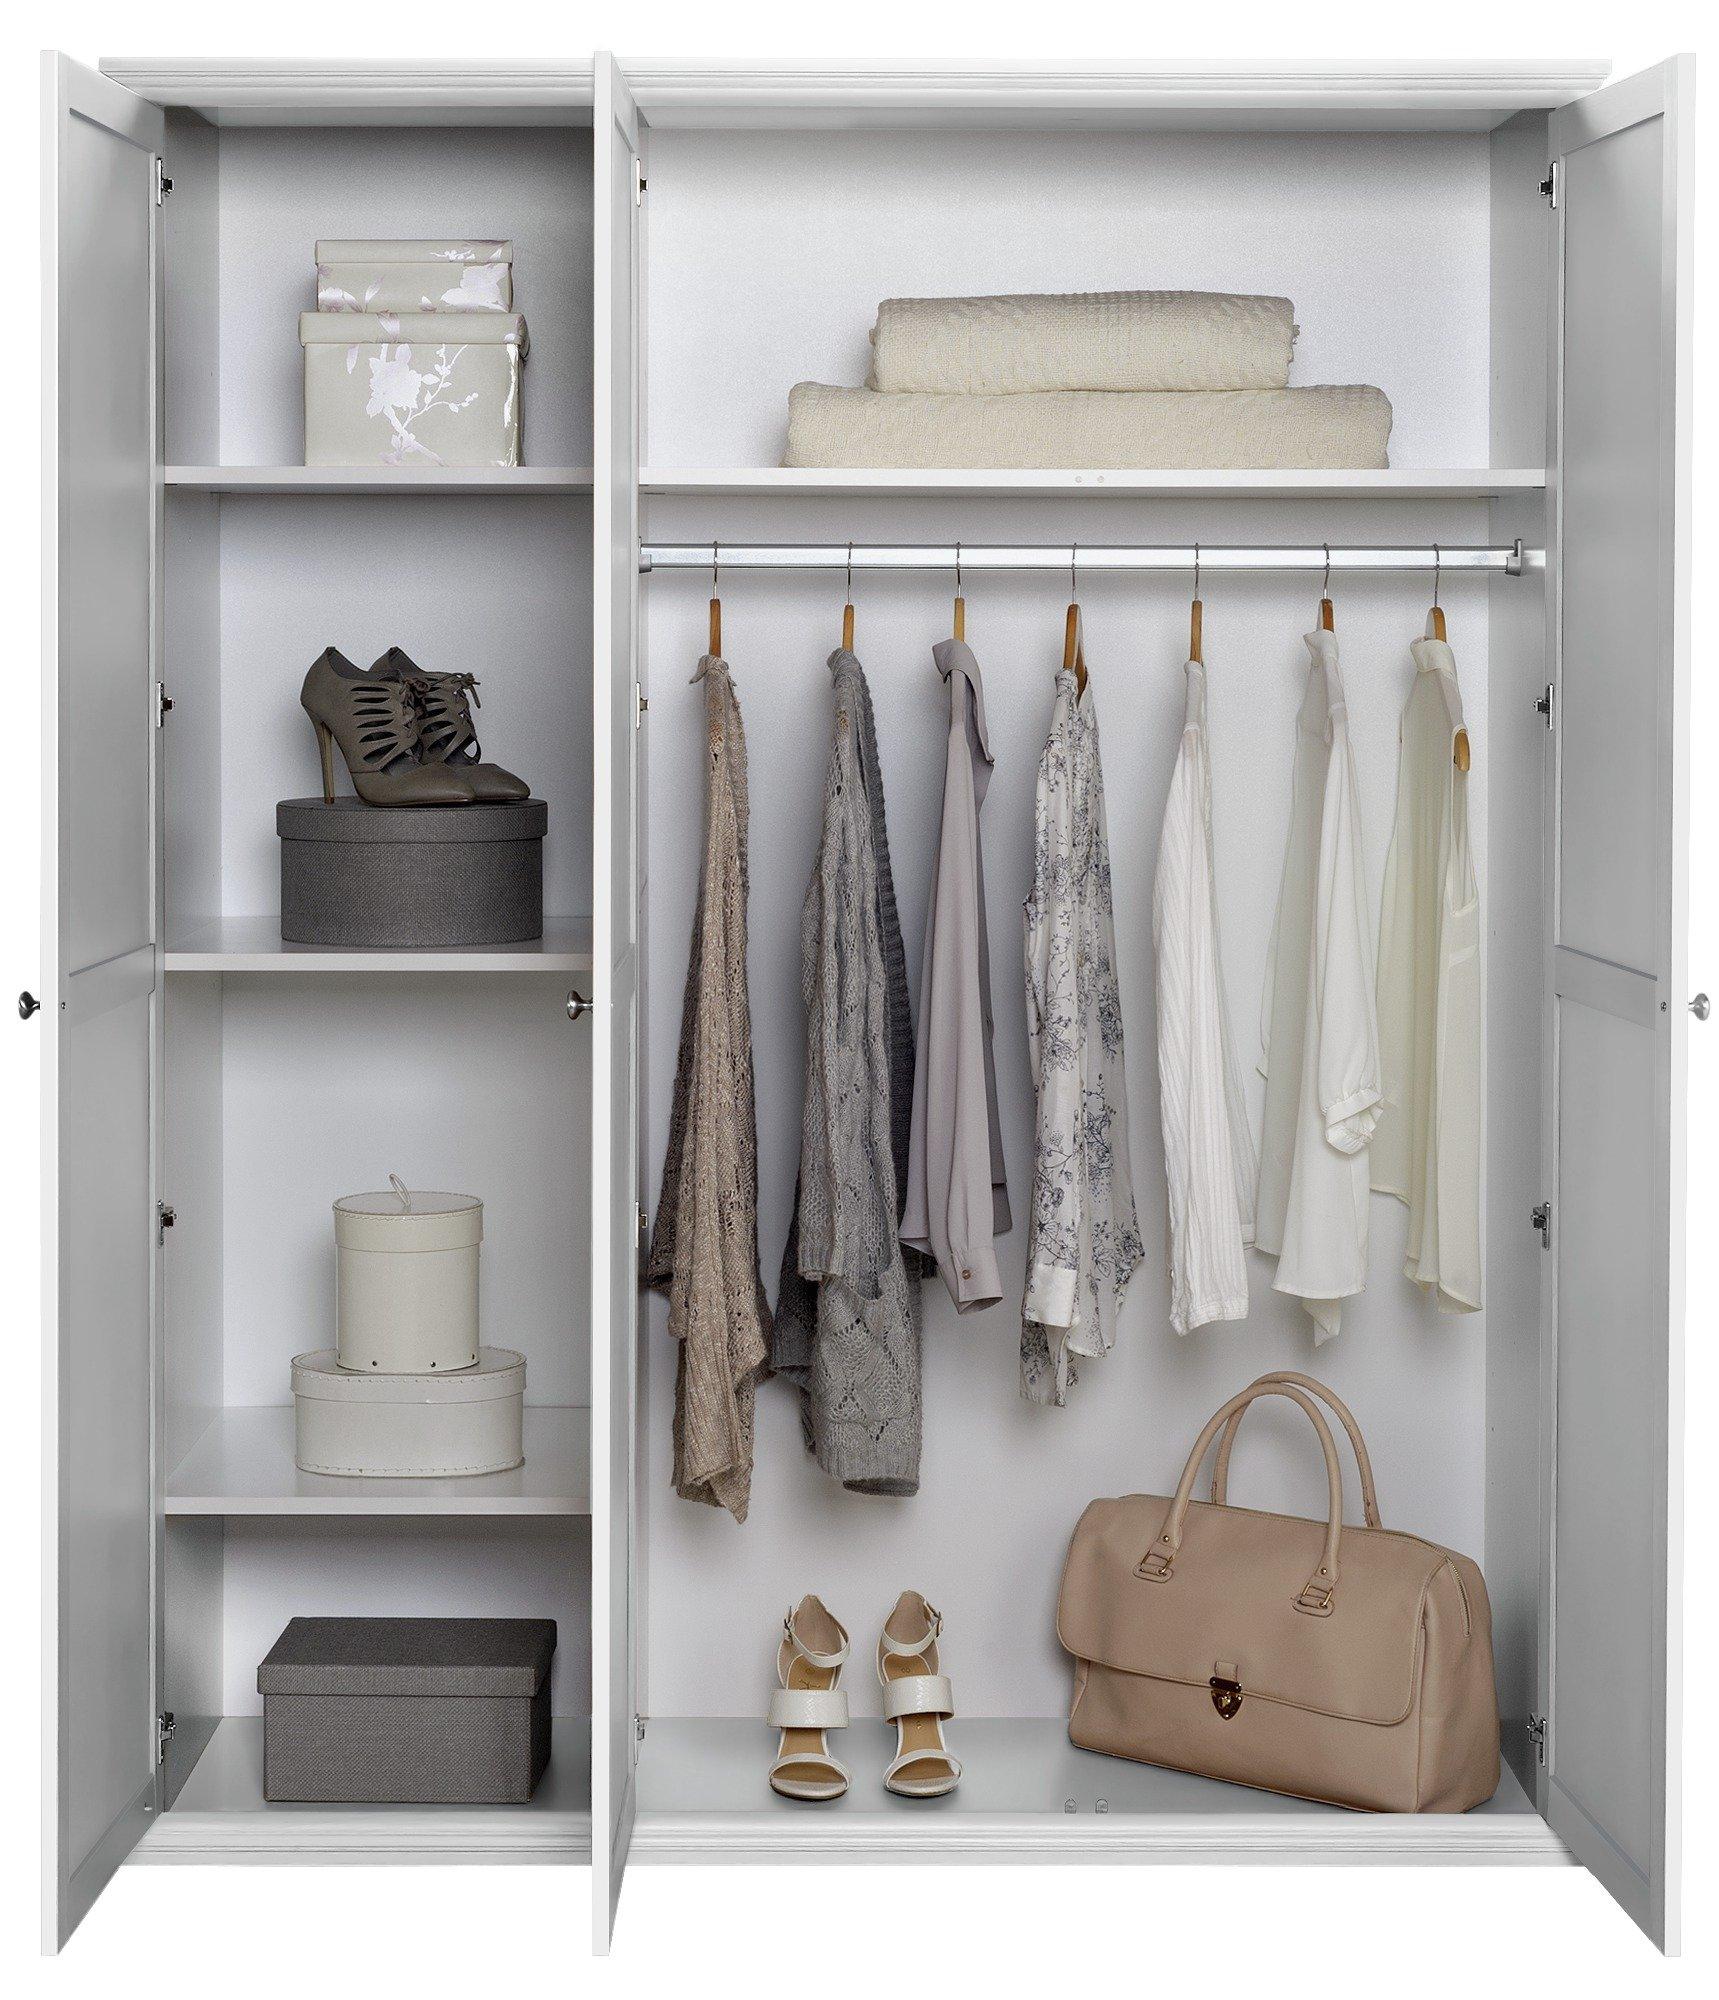 Buy Home Canterbury 3 Door Wardrobe White At Argos Co Uk